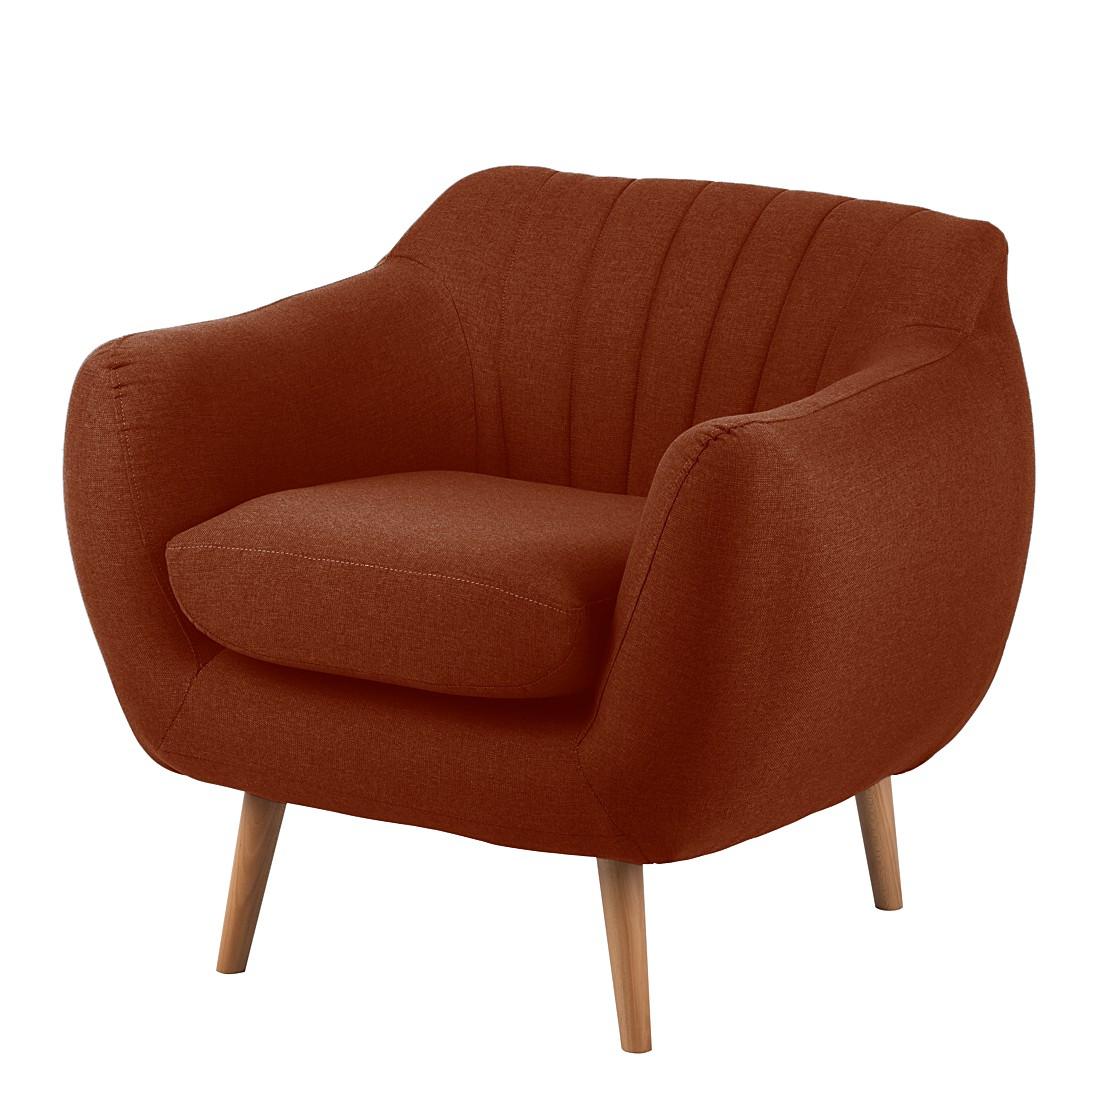 Sessel Molly – Webstoff Terracotta, Mørteens online kaufen